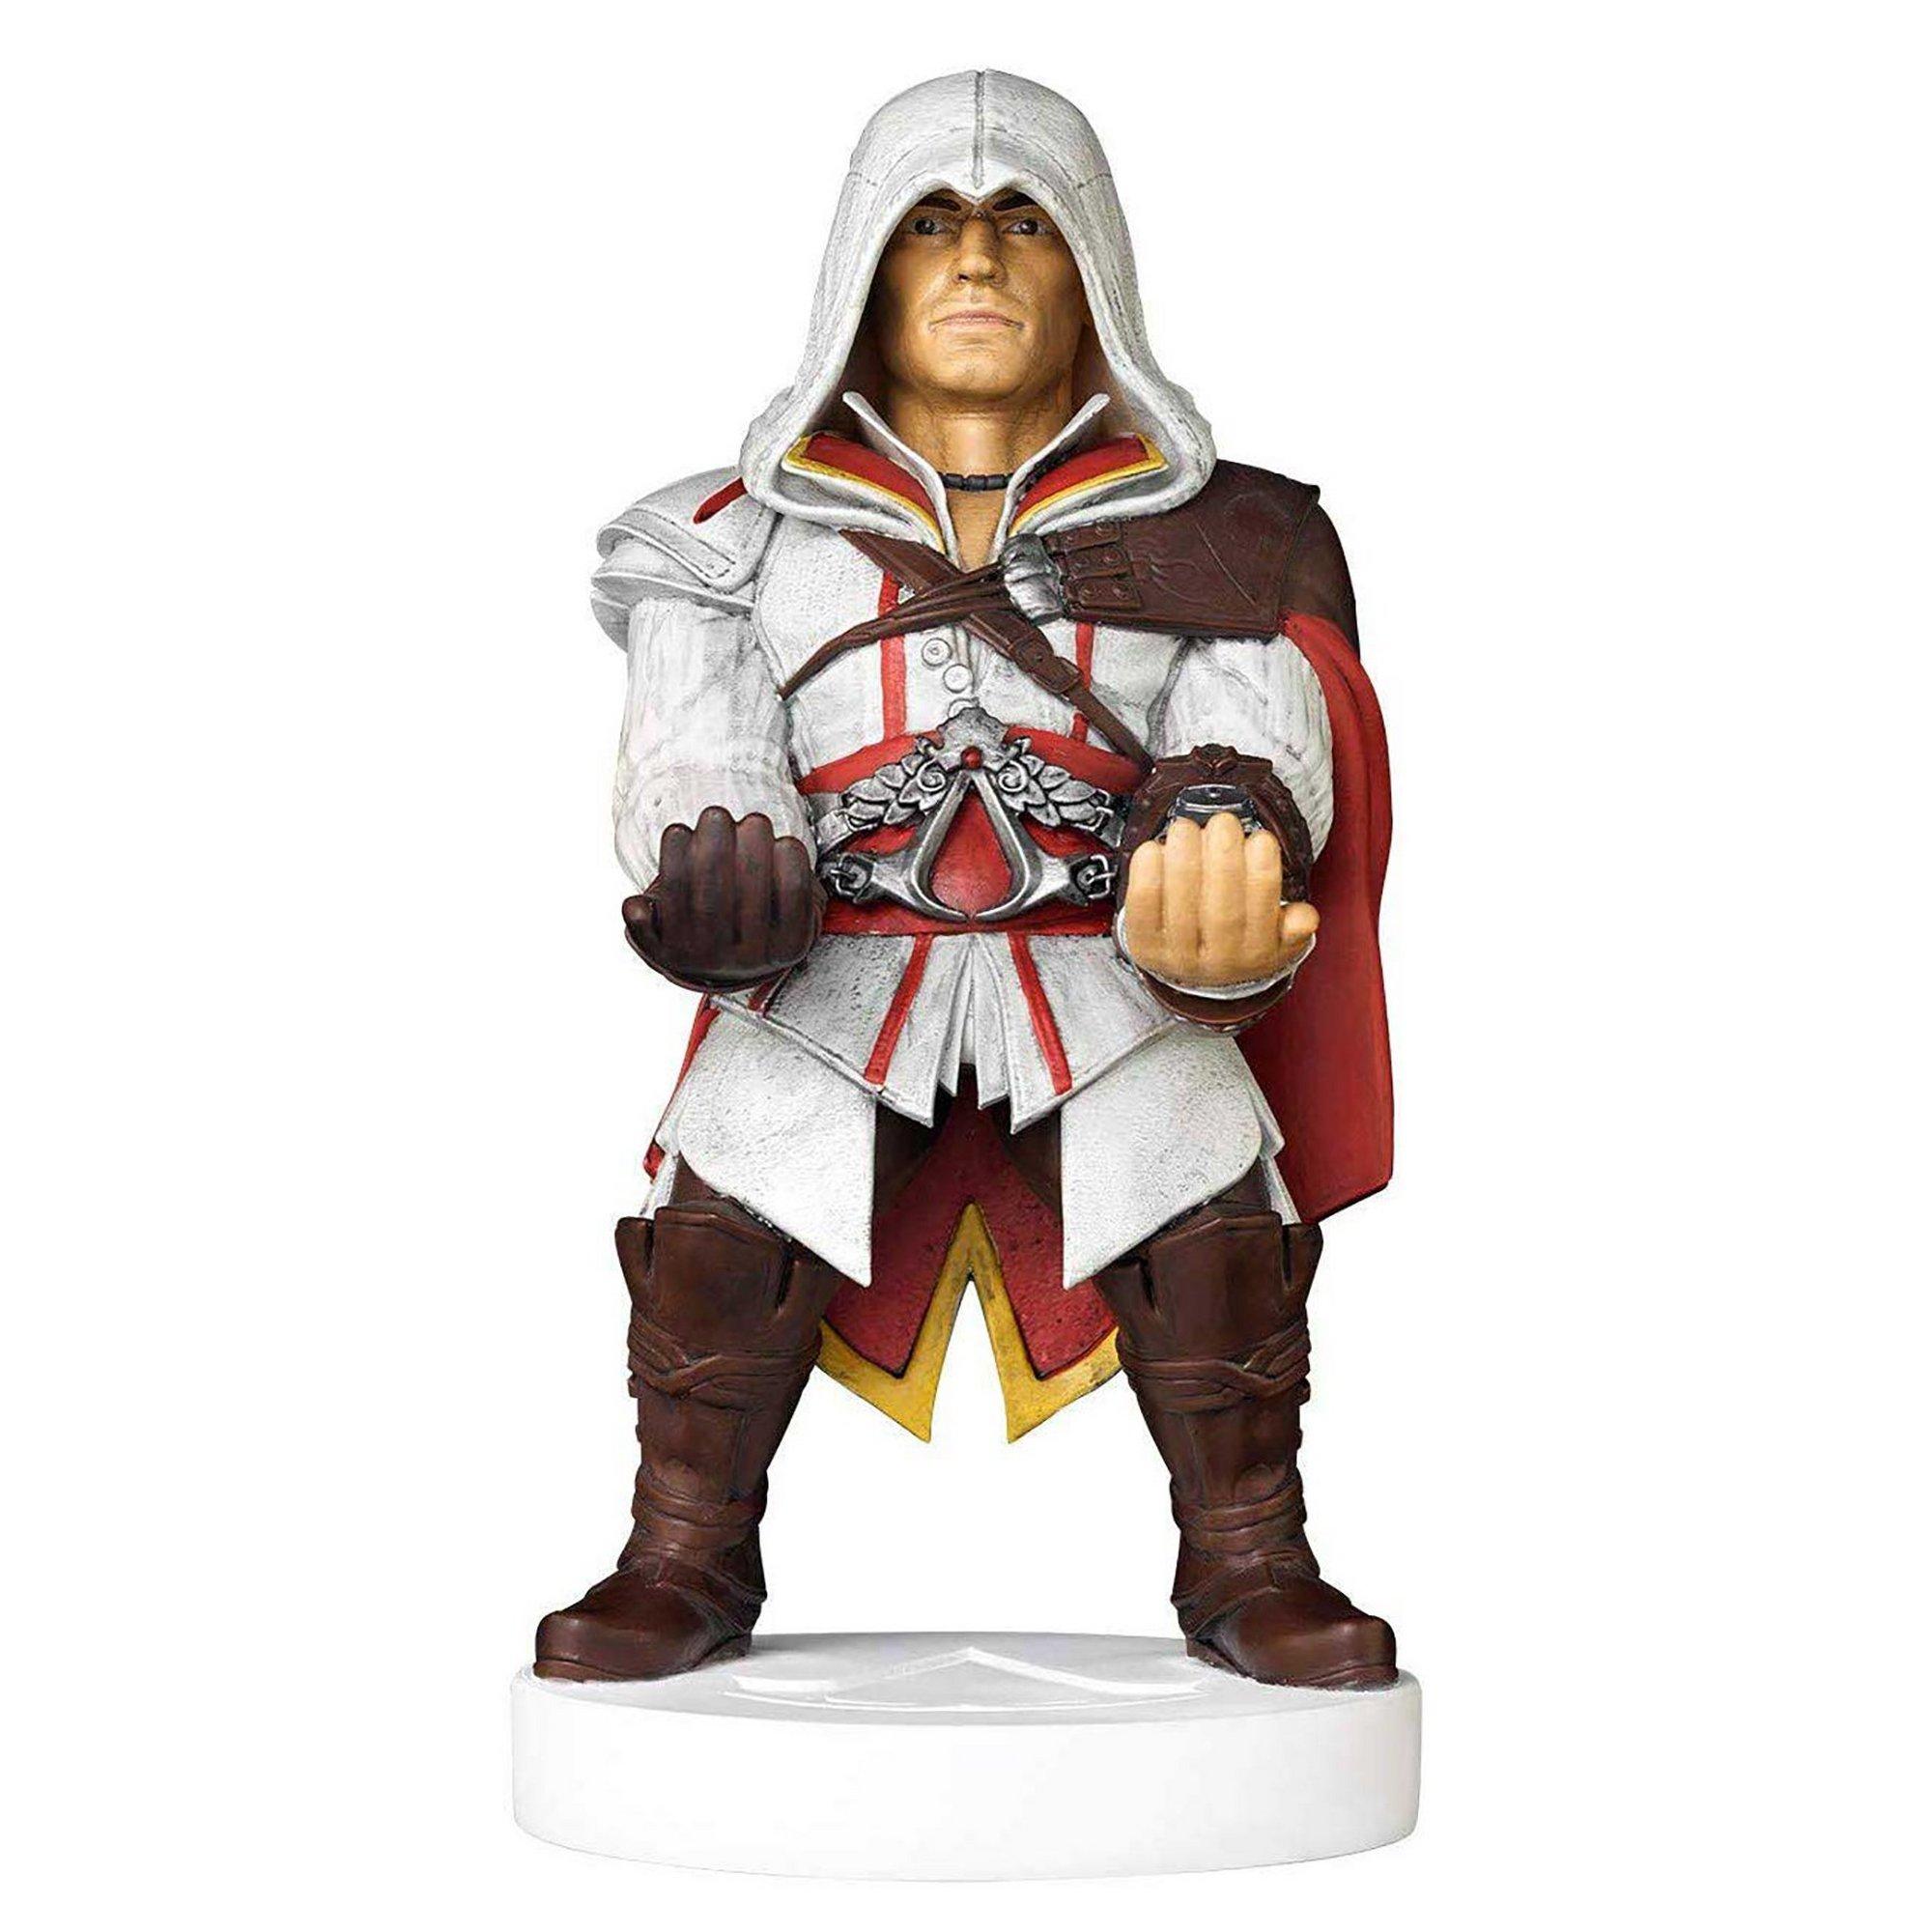 Image of AC Ezio Cable Guy